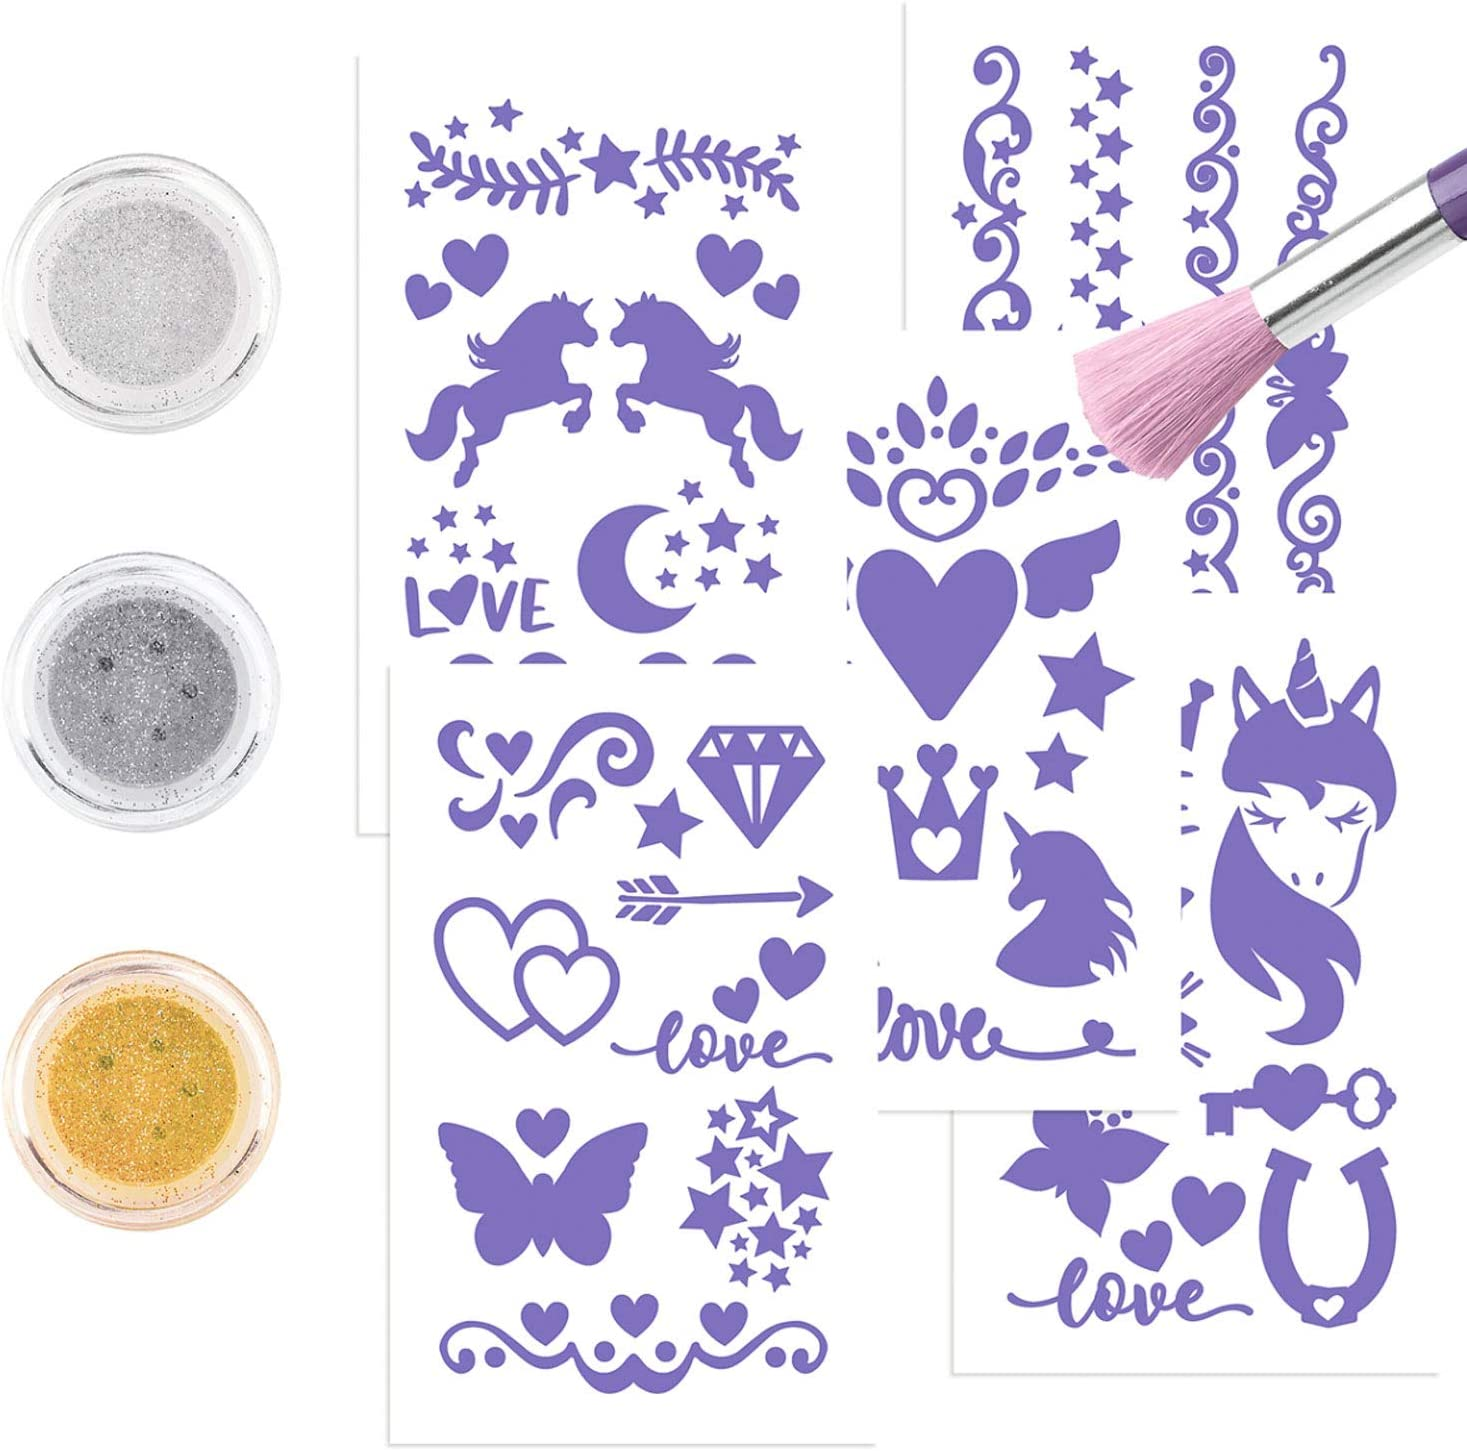 con 44 Tatuajes Adhesivos 14 x 15,5 x 2 cm Depesche- Ylvi /& The Minimoomis-Set Aprox 11326 3 Botes de Polvo de Purpurina y un Pincel